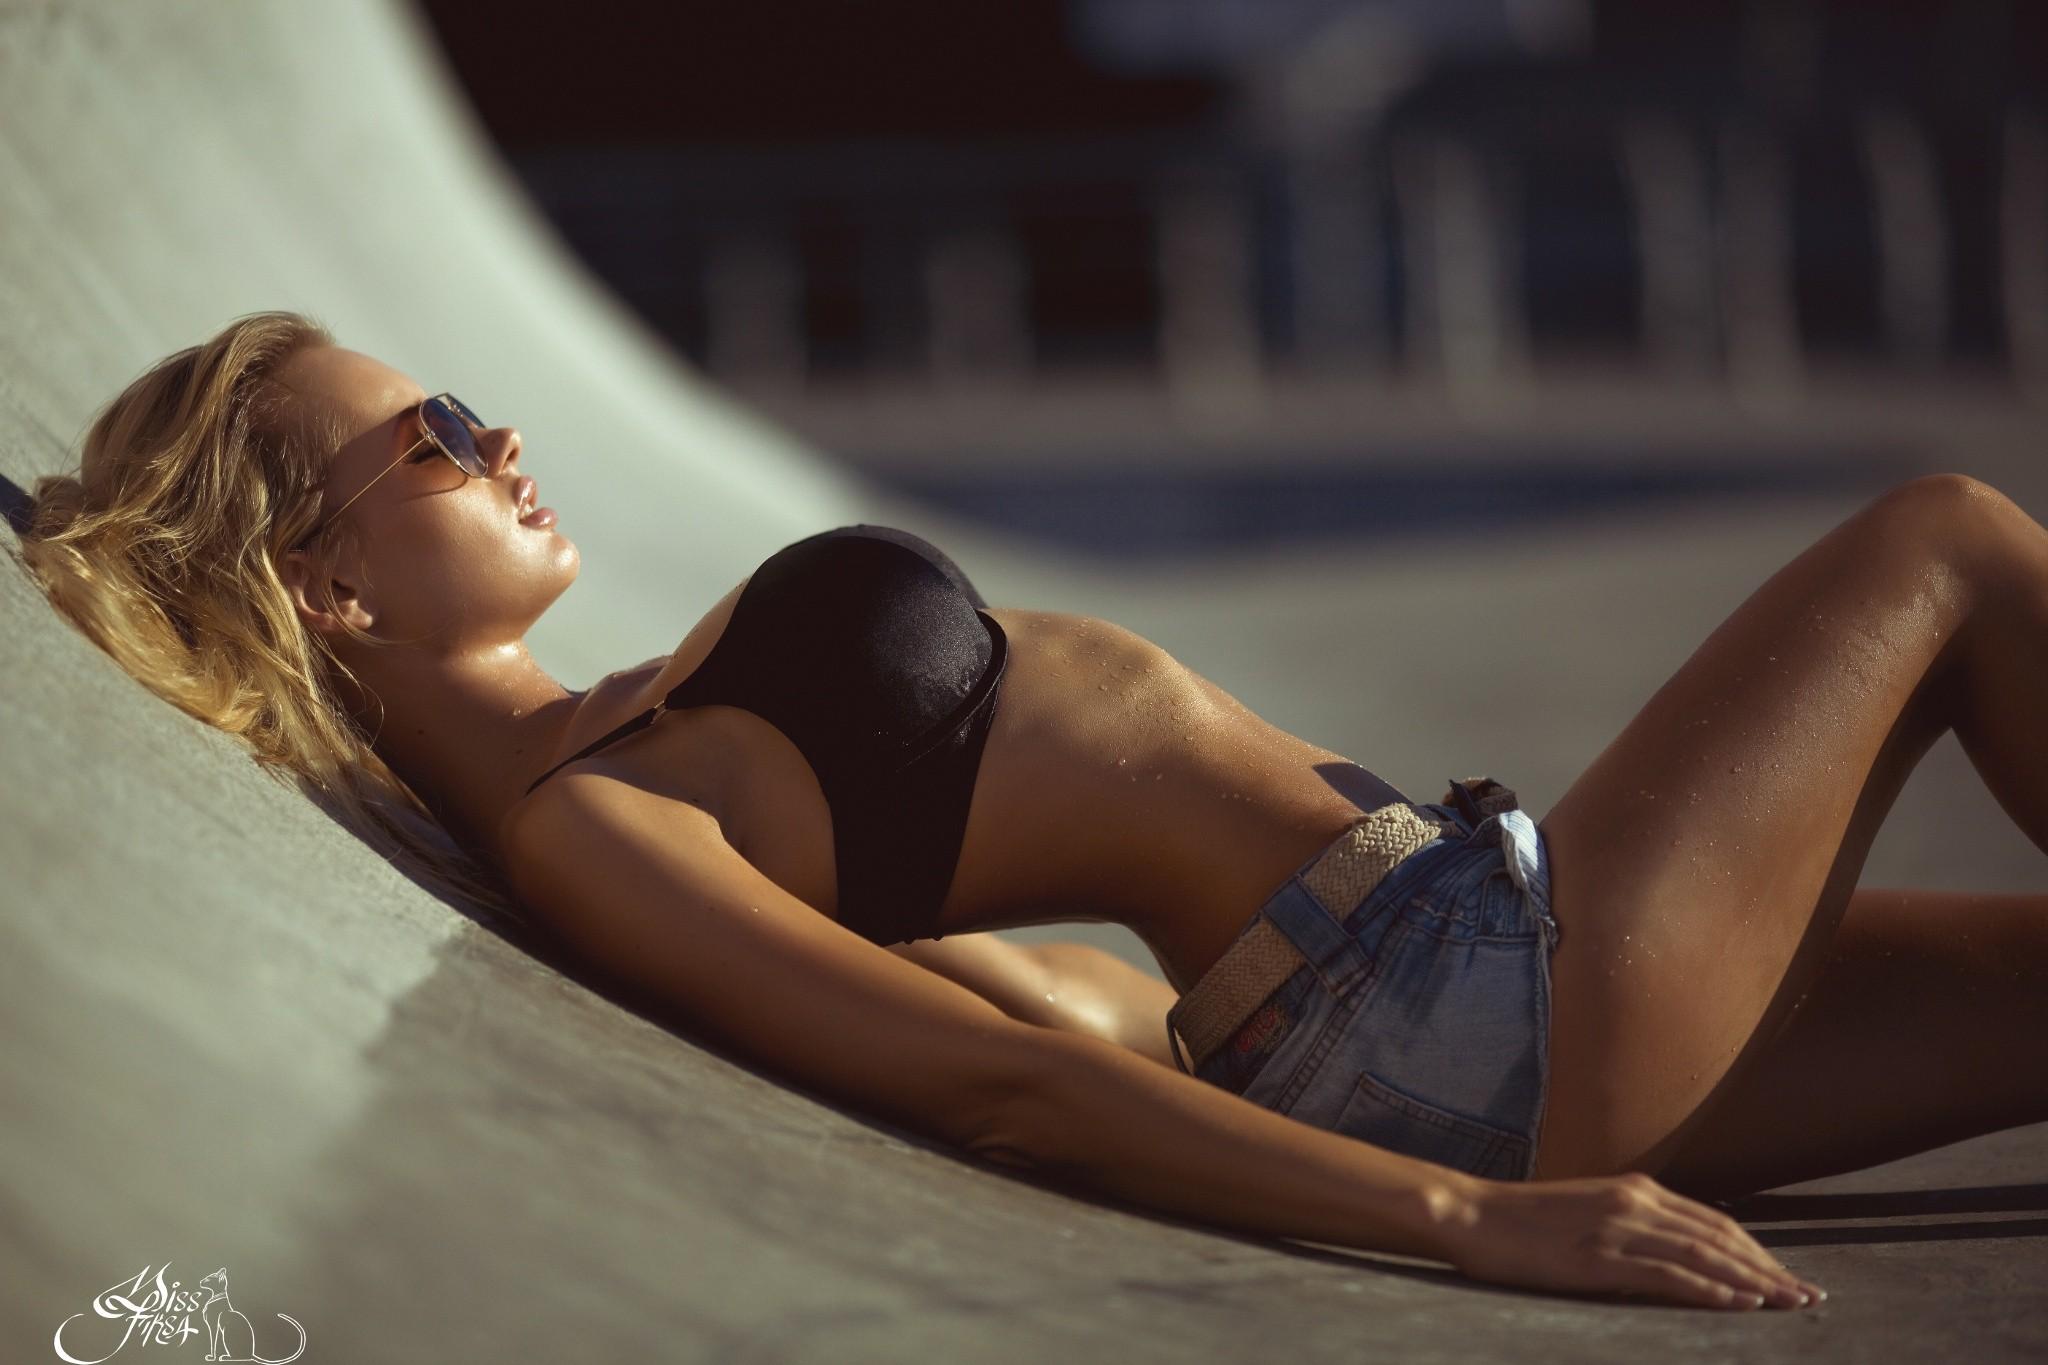 People 2048x1365 women model blonde glasses jean shorts big boobs sunglasses women outdoors women with glasses black bras Miss Fiksa wet body water drops sweat Olya Abramovich